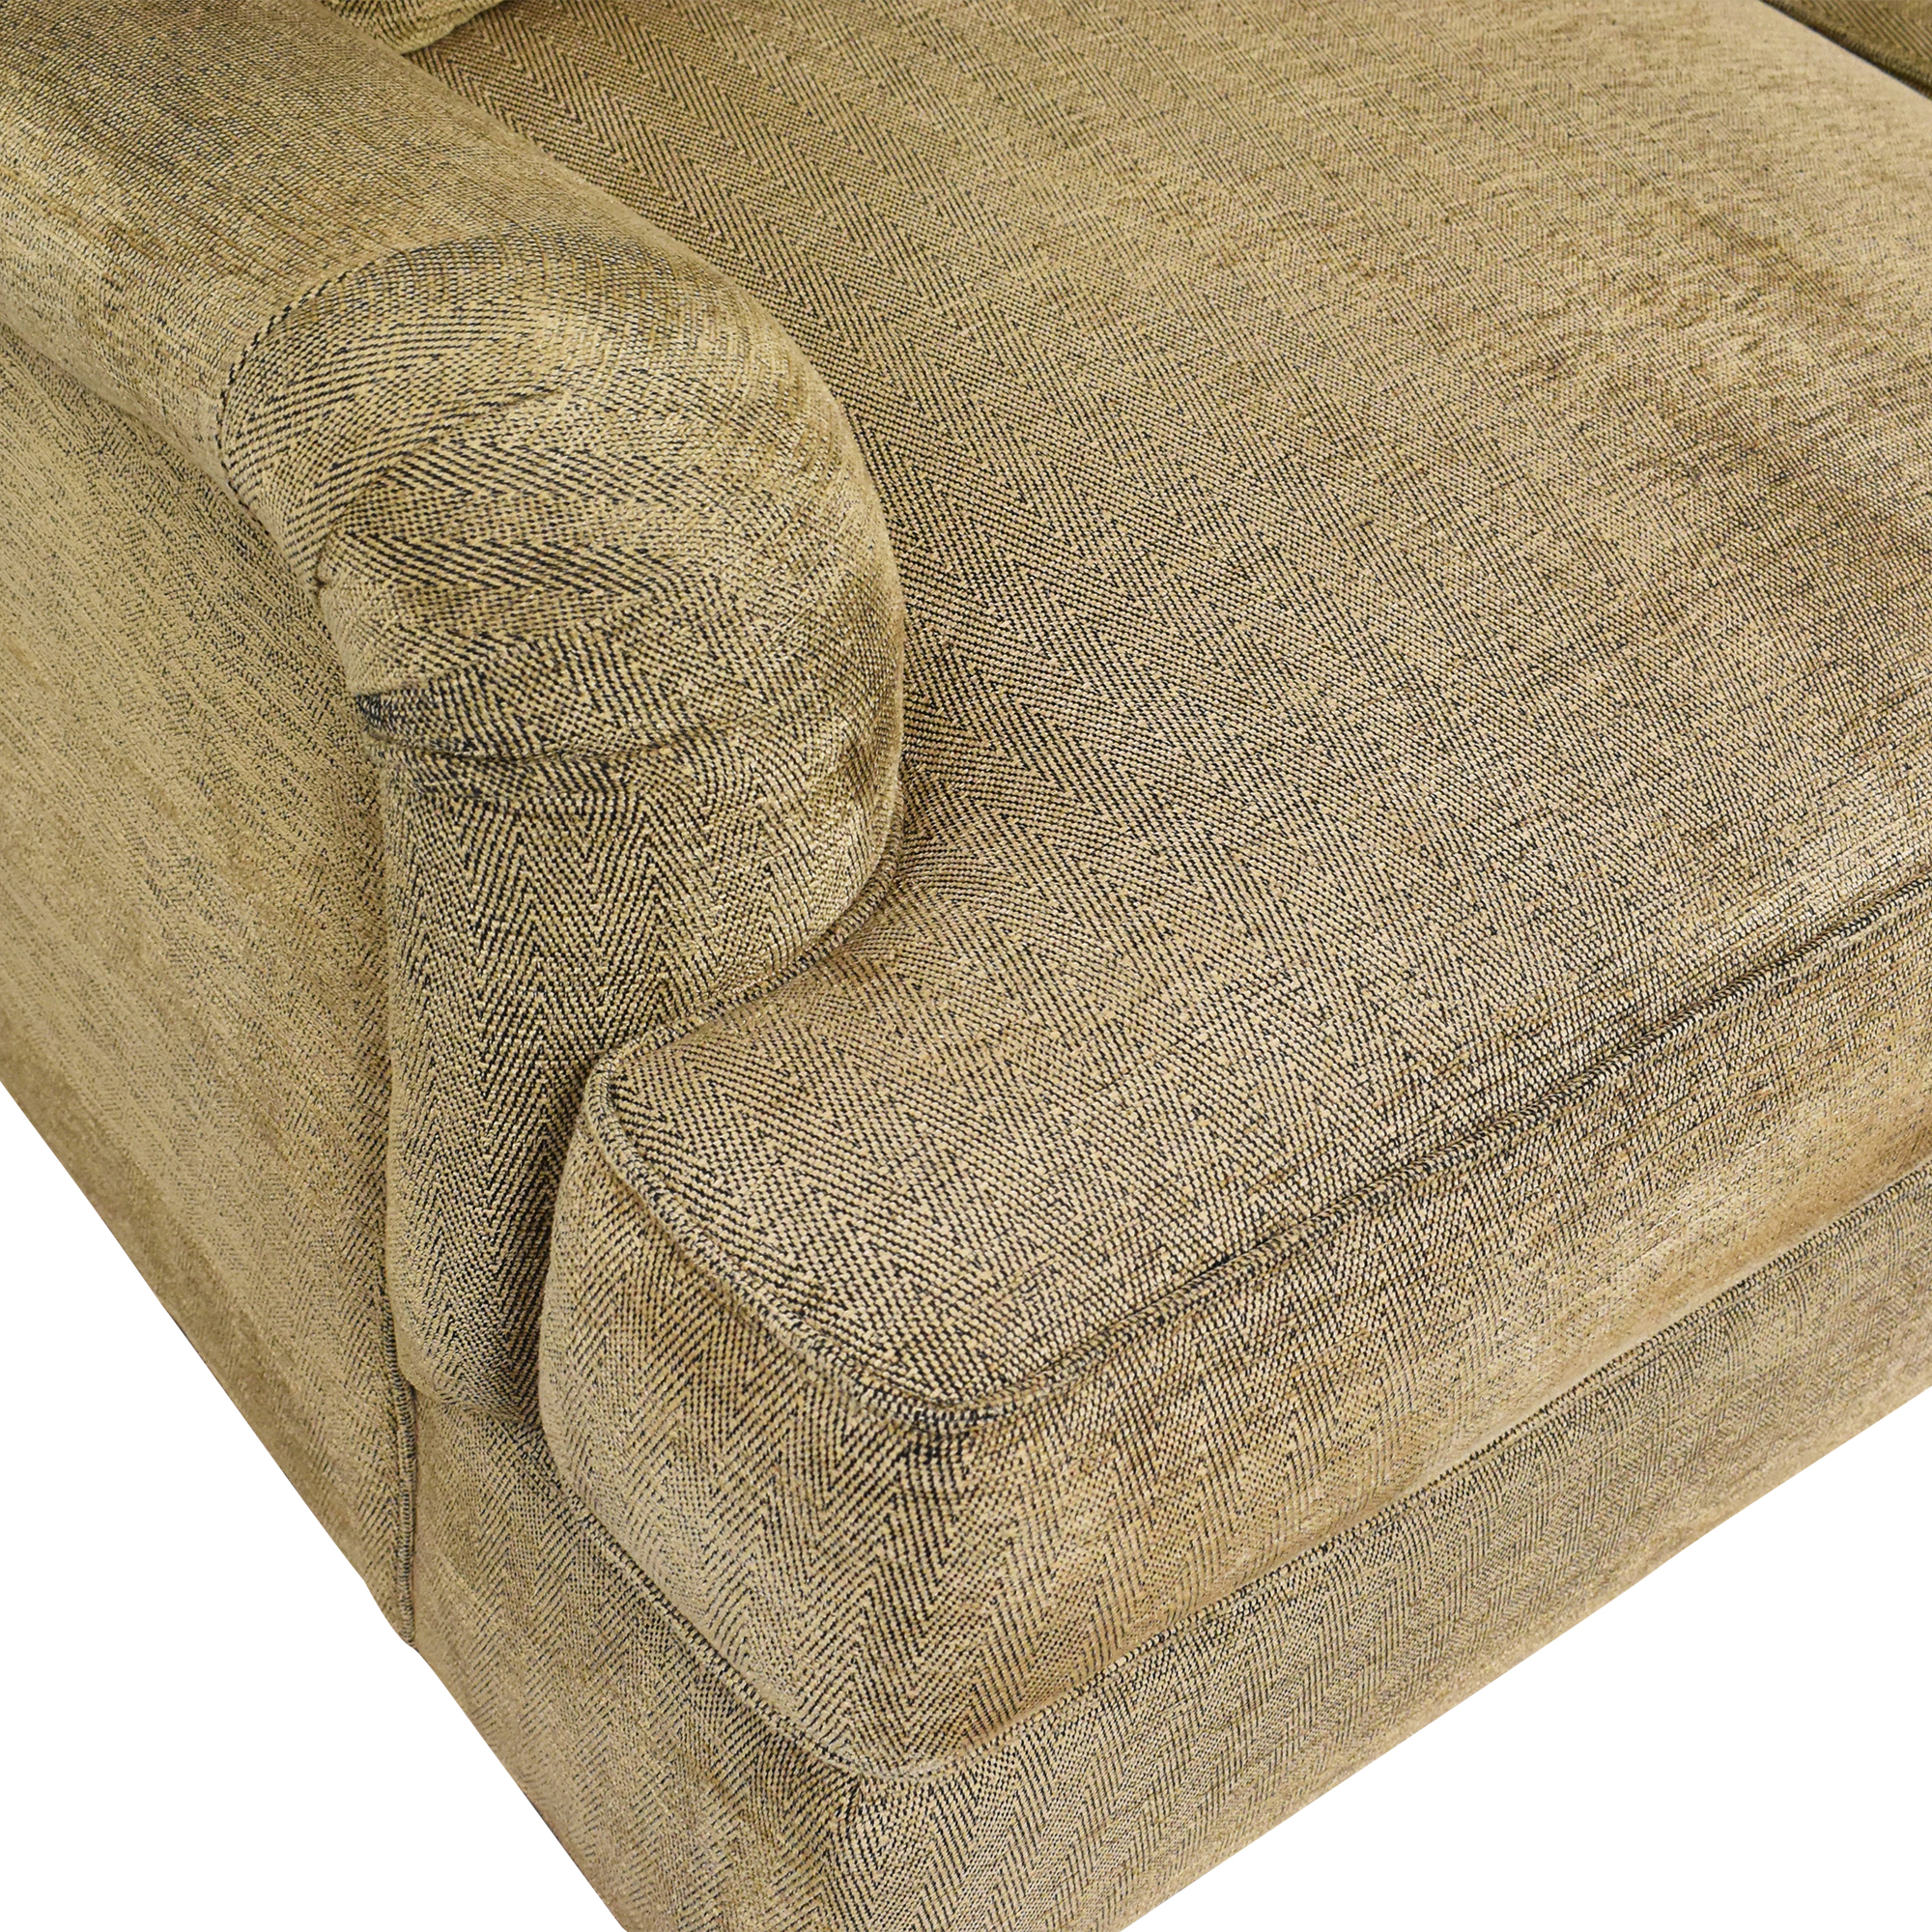 Henredon Furniture Henredon Furniture Mid-Century Modern Couch Sofas